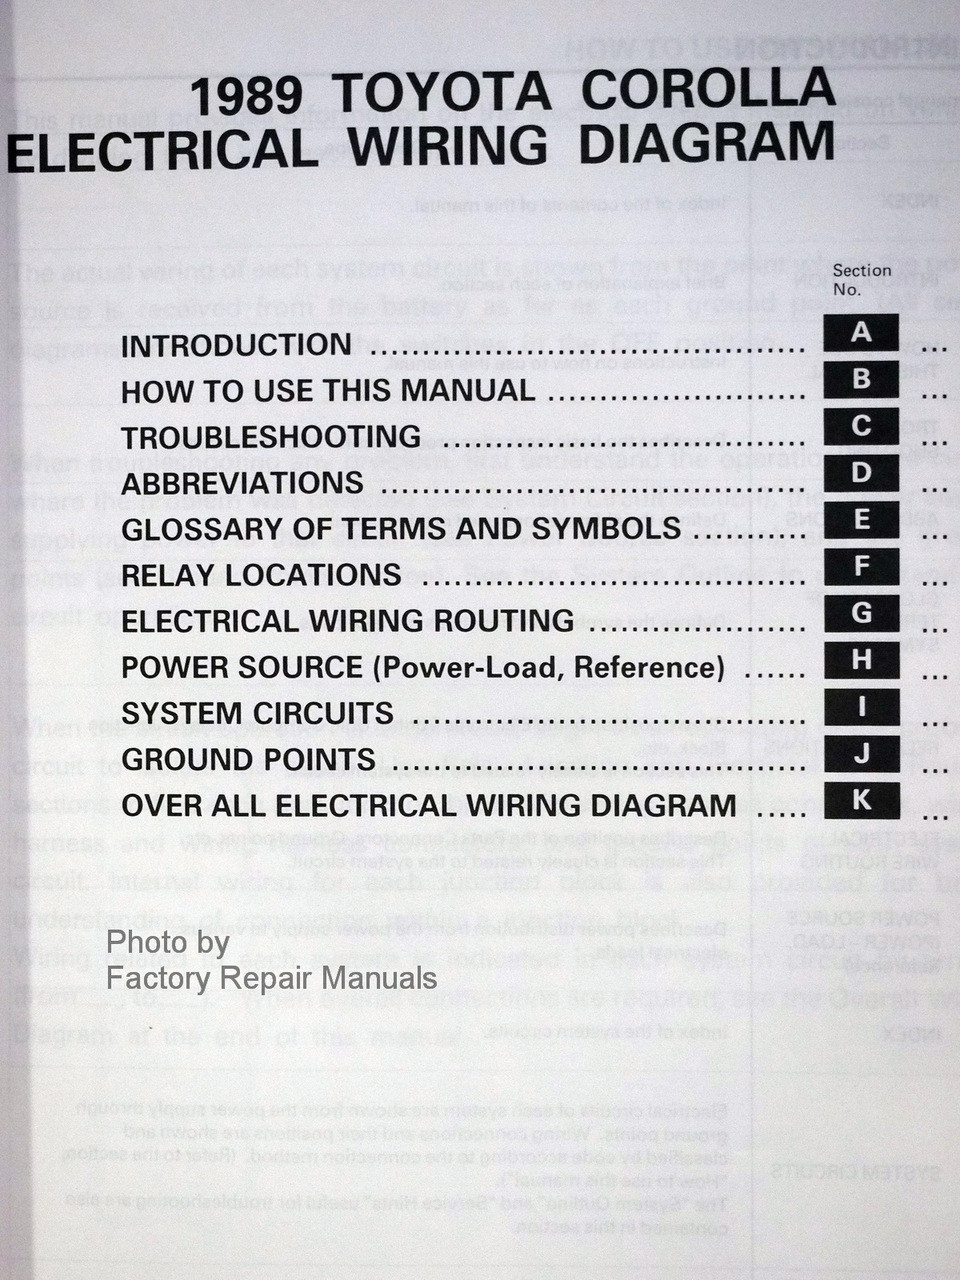 1989 Toyota Van Wiring Diagram